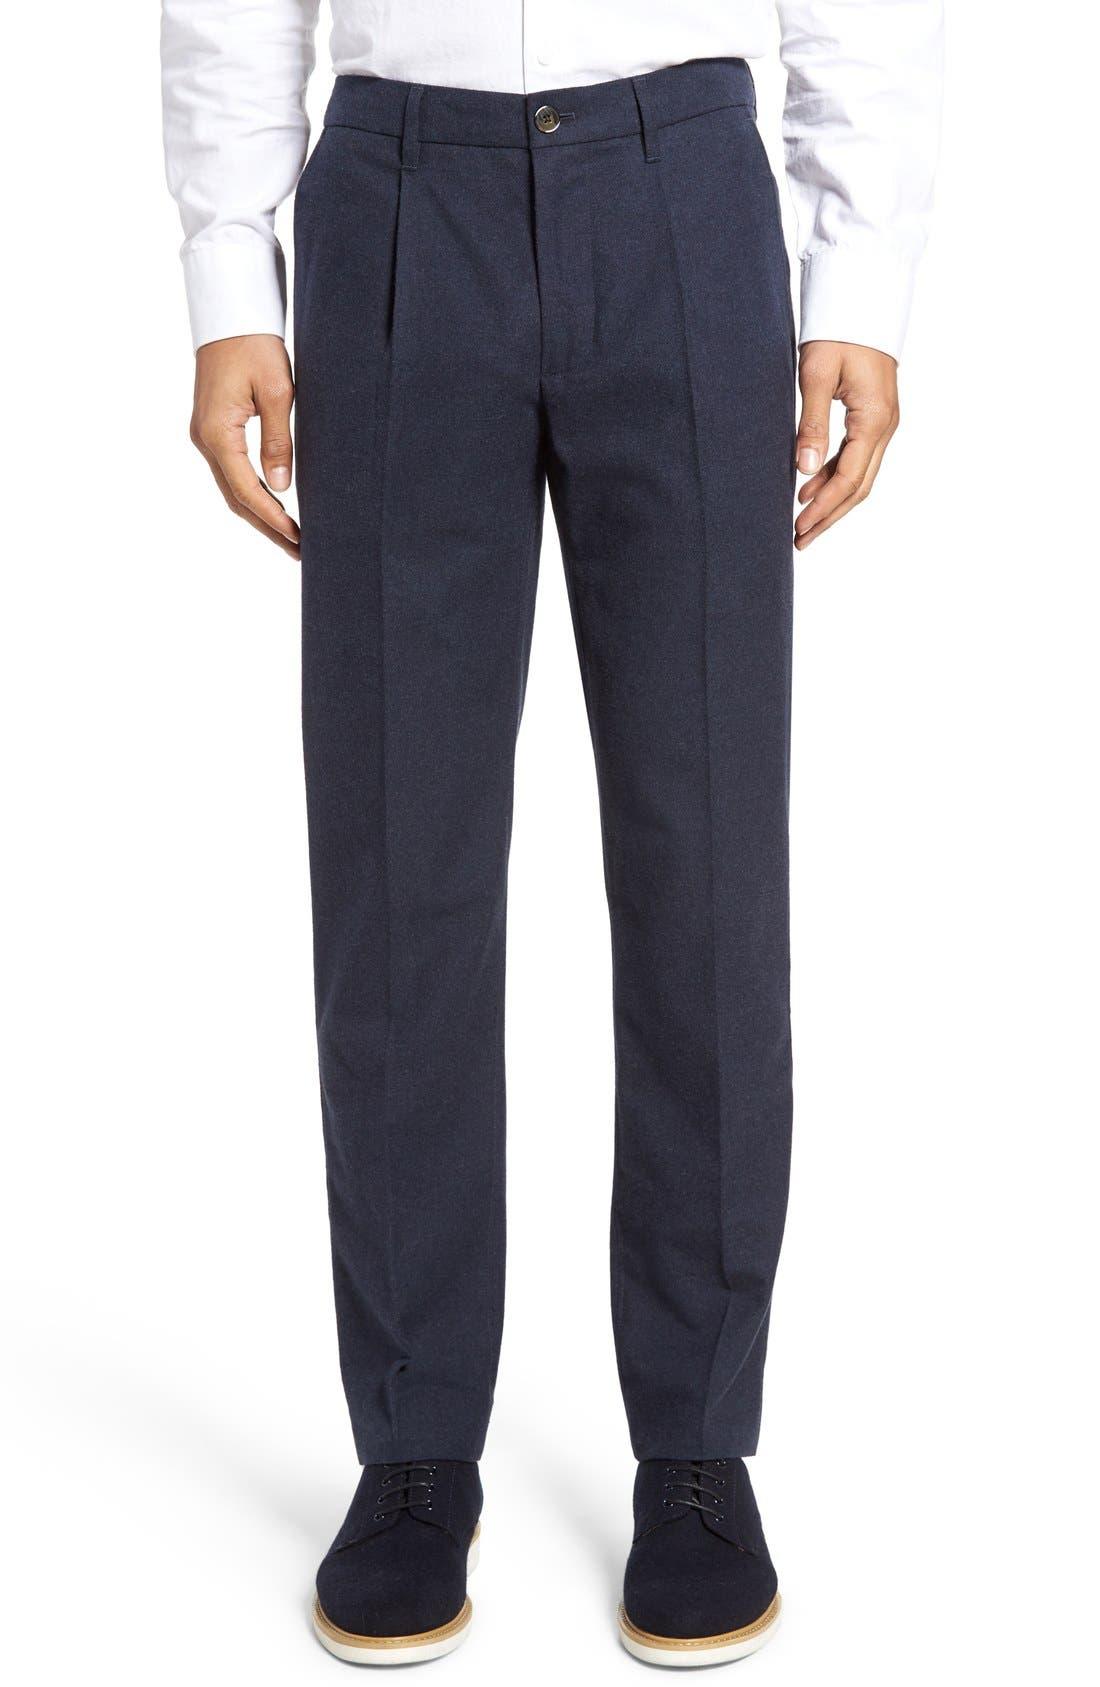 BONOBOS,                             Slim Fit Flannel Trousers,                             Main thumbnail 1, color,                             400